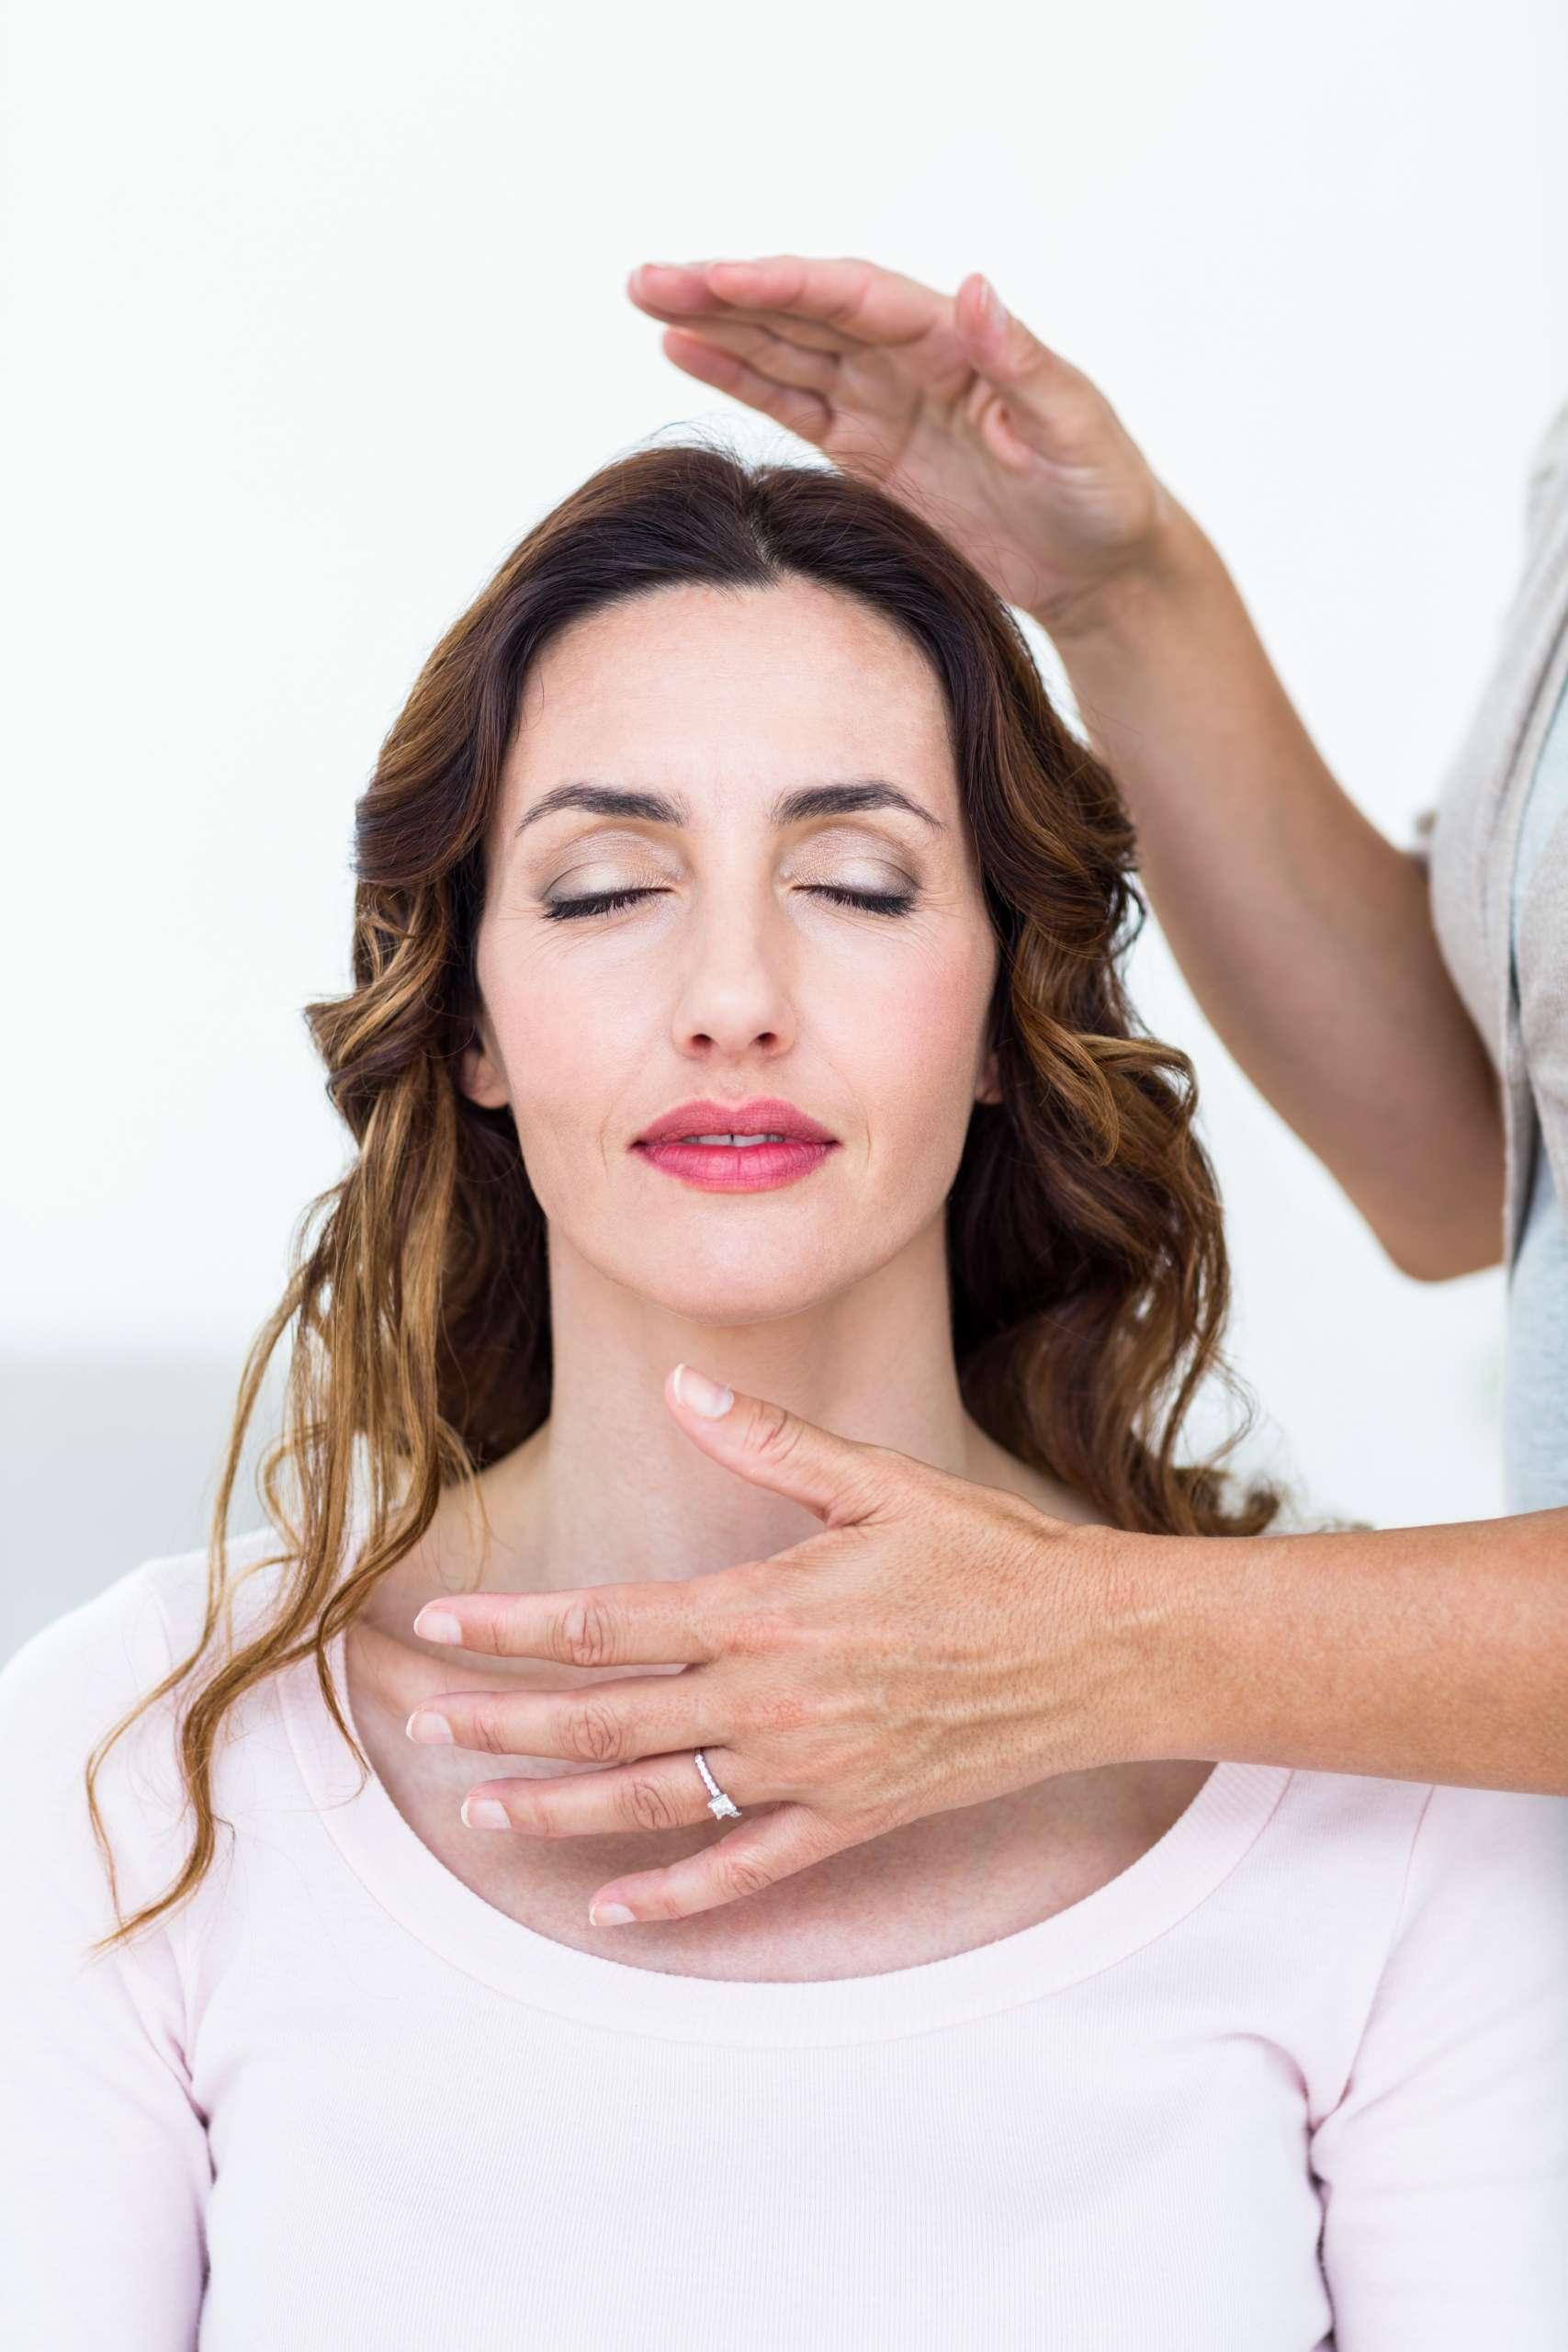 Alexandre-Blouin-massage-Laval-formation-Reiki-2